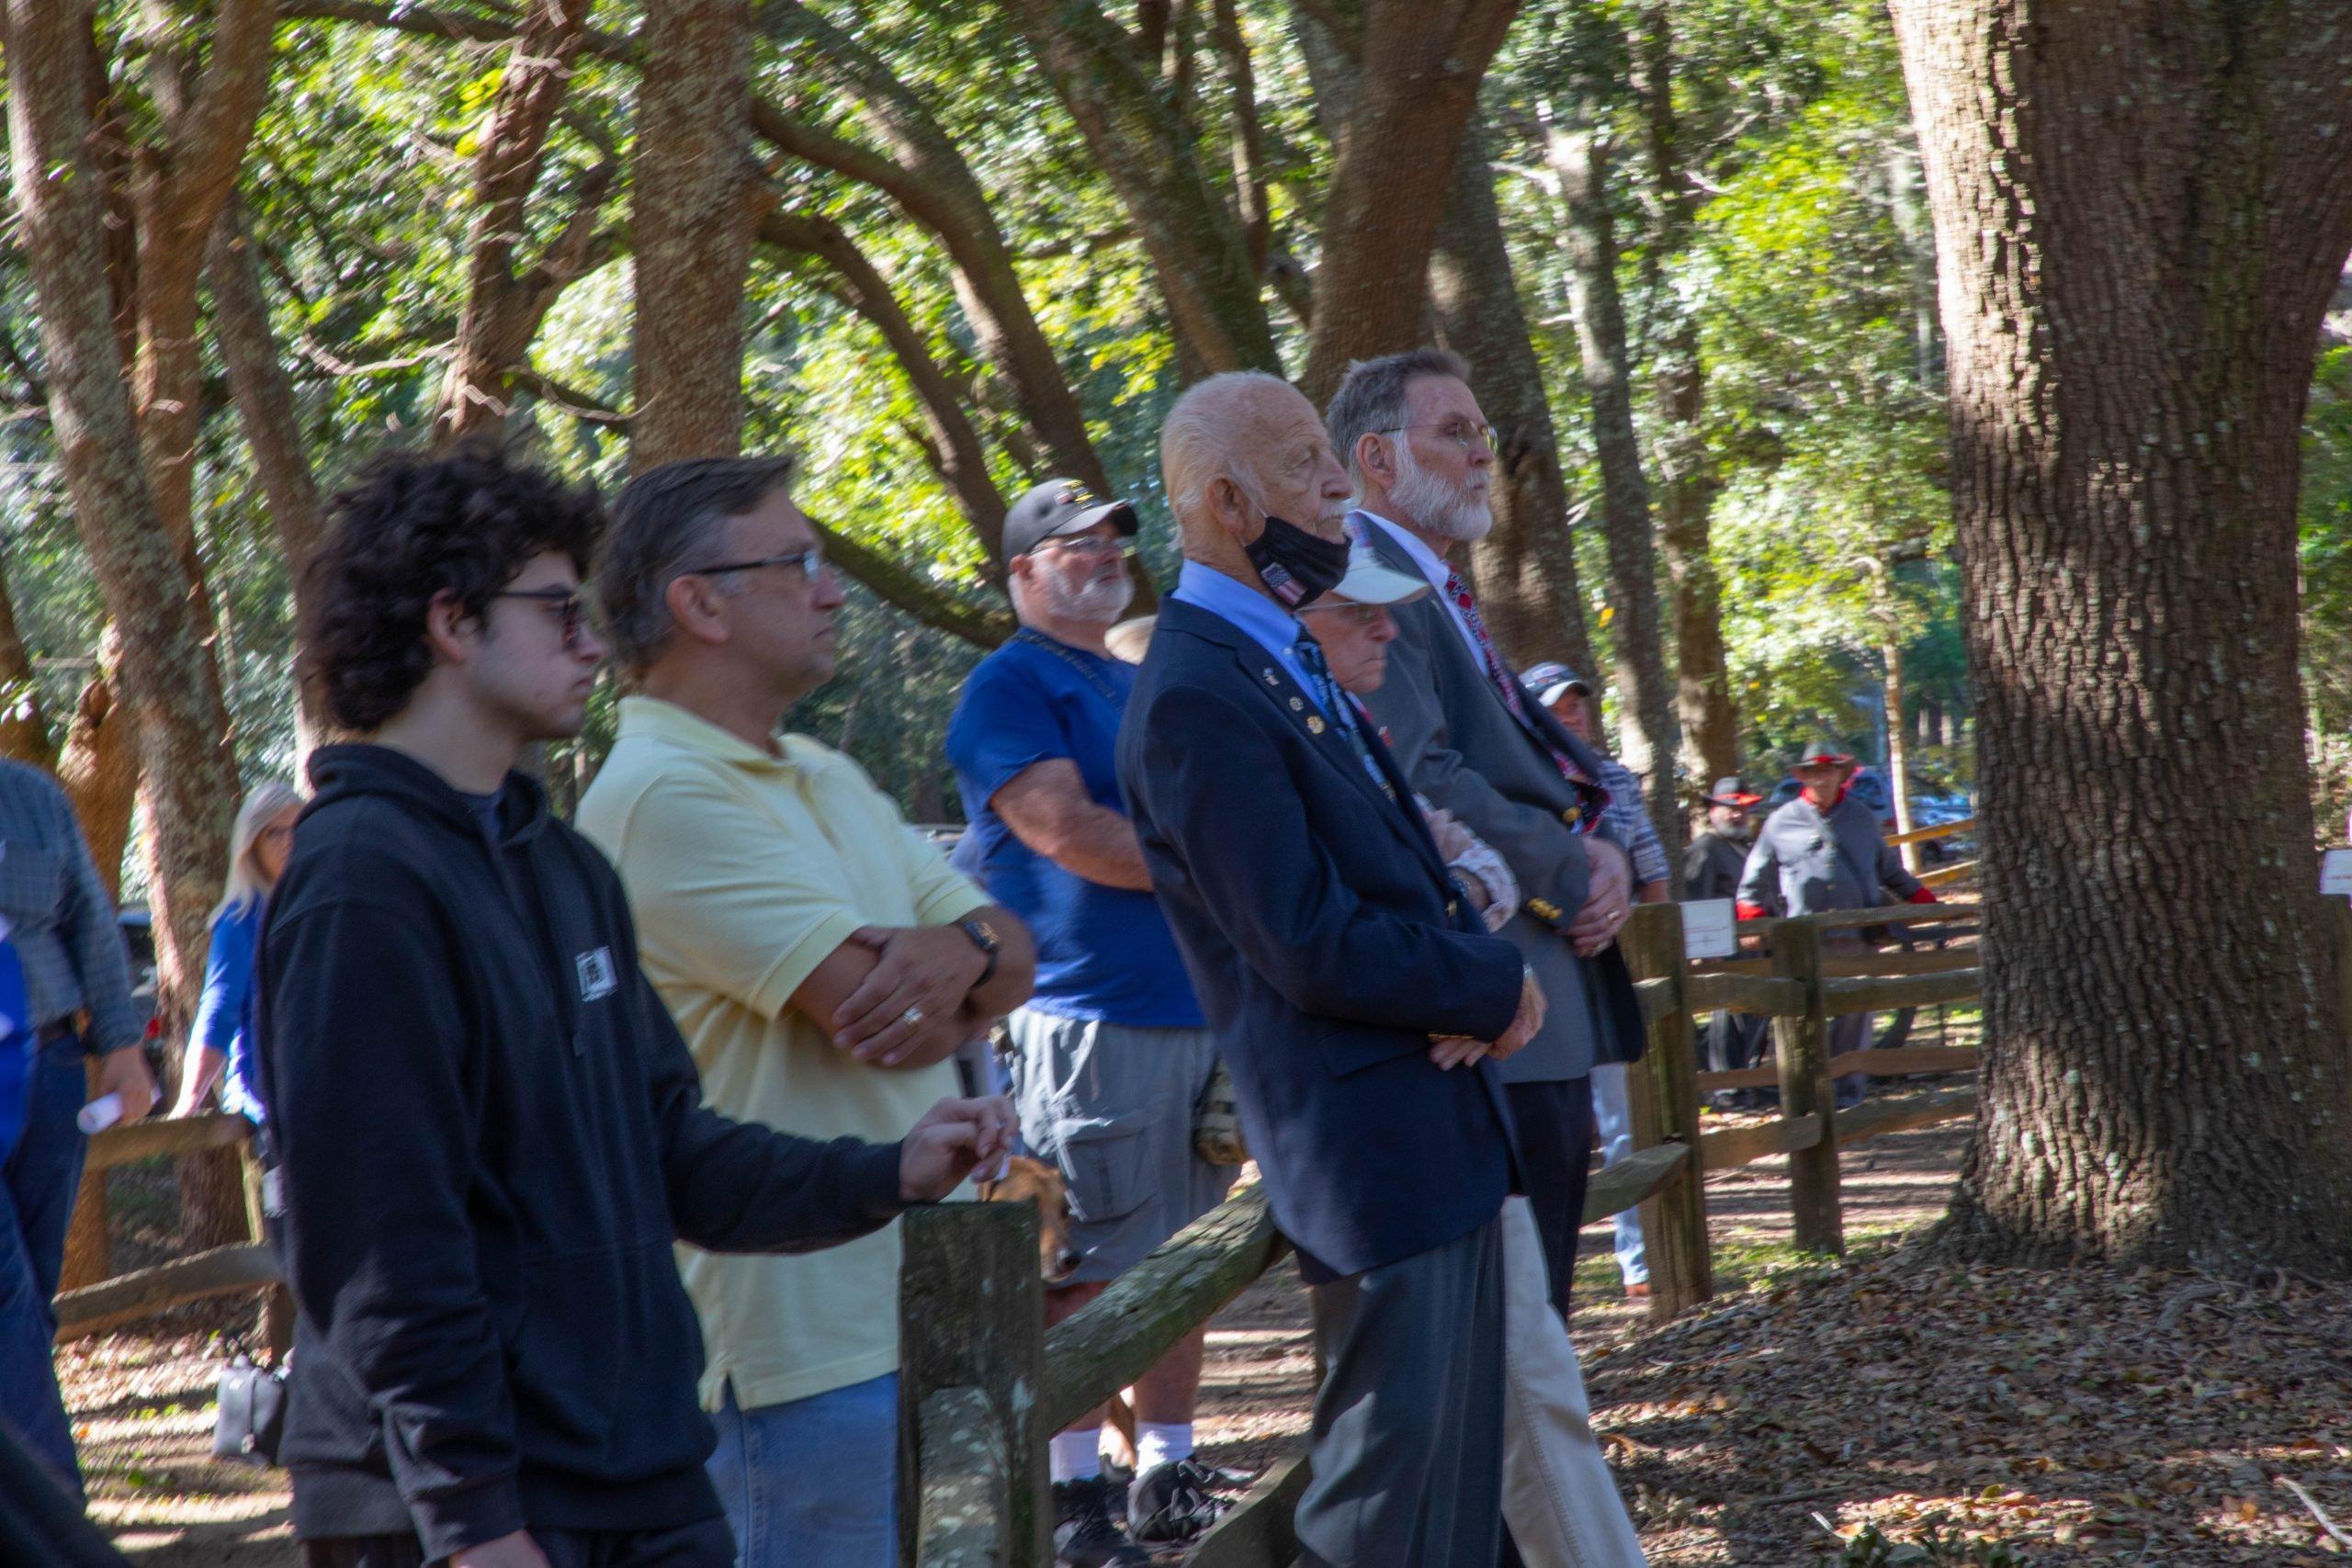 Sons of Confederate Veterans (25)